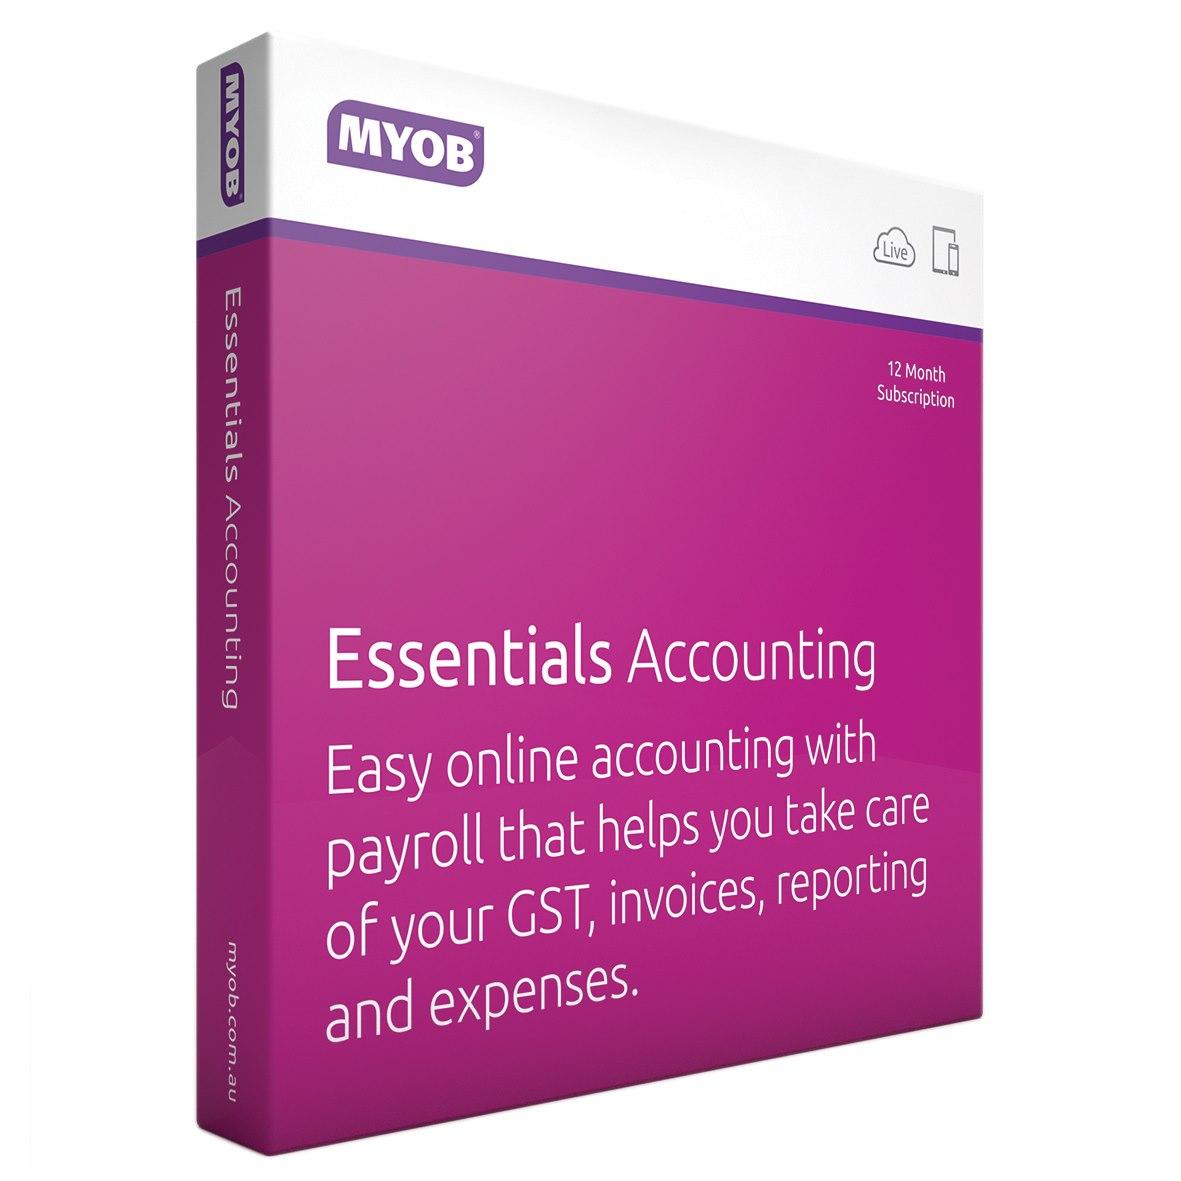 MYOB Essentials Accounting With Payroll